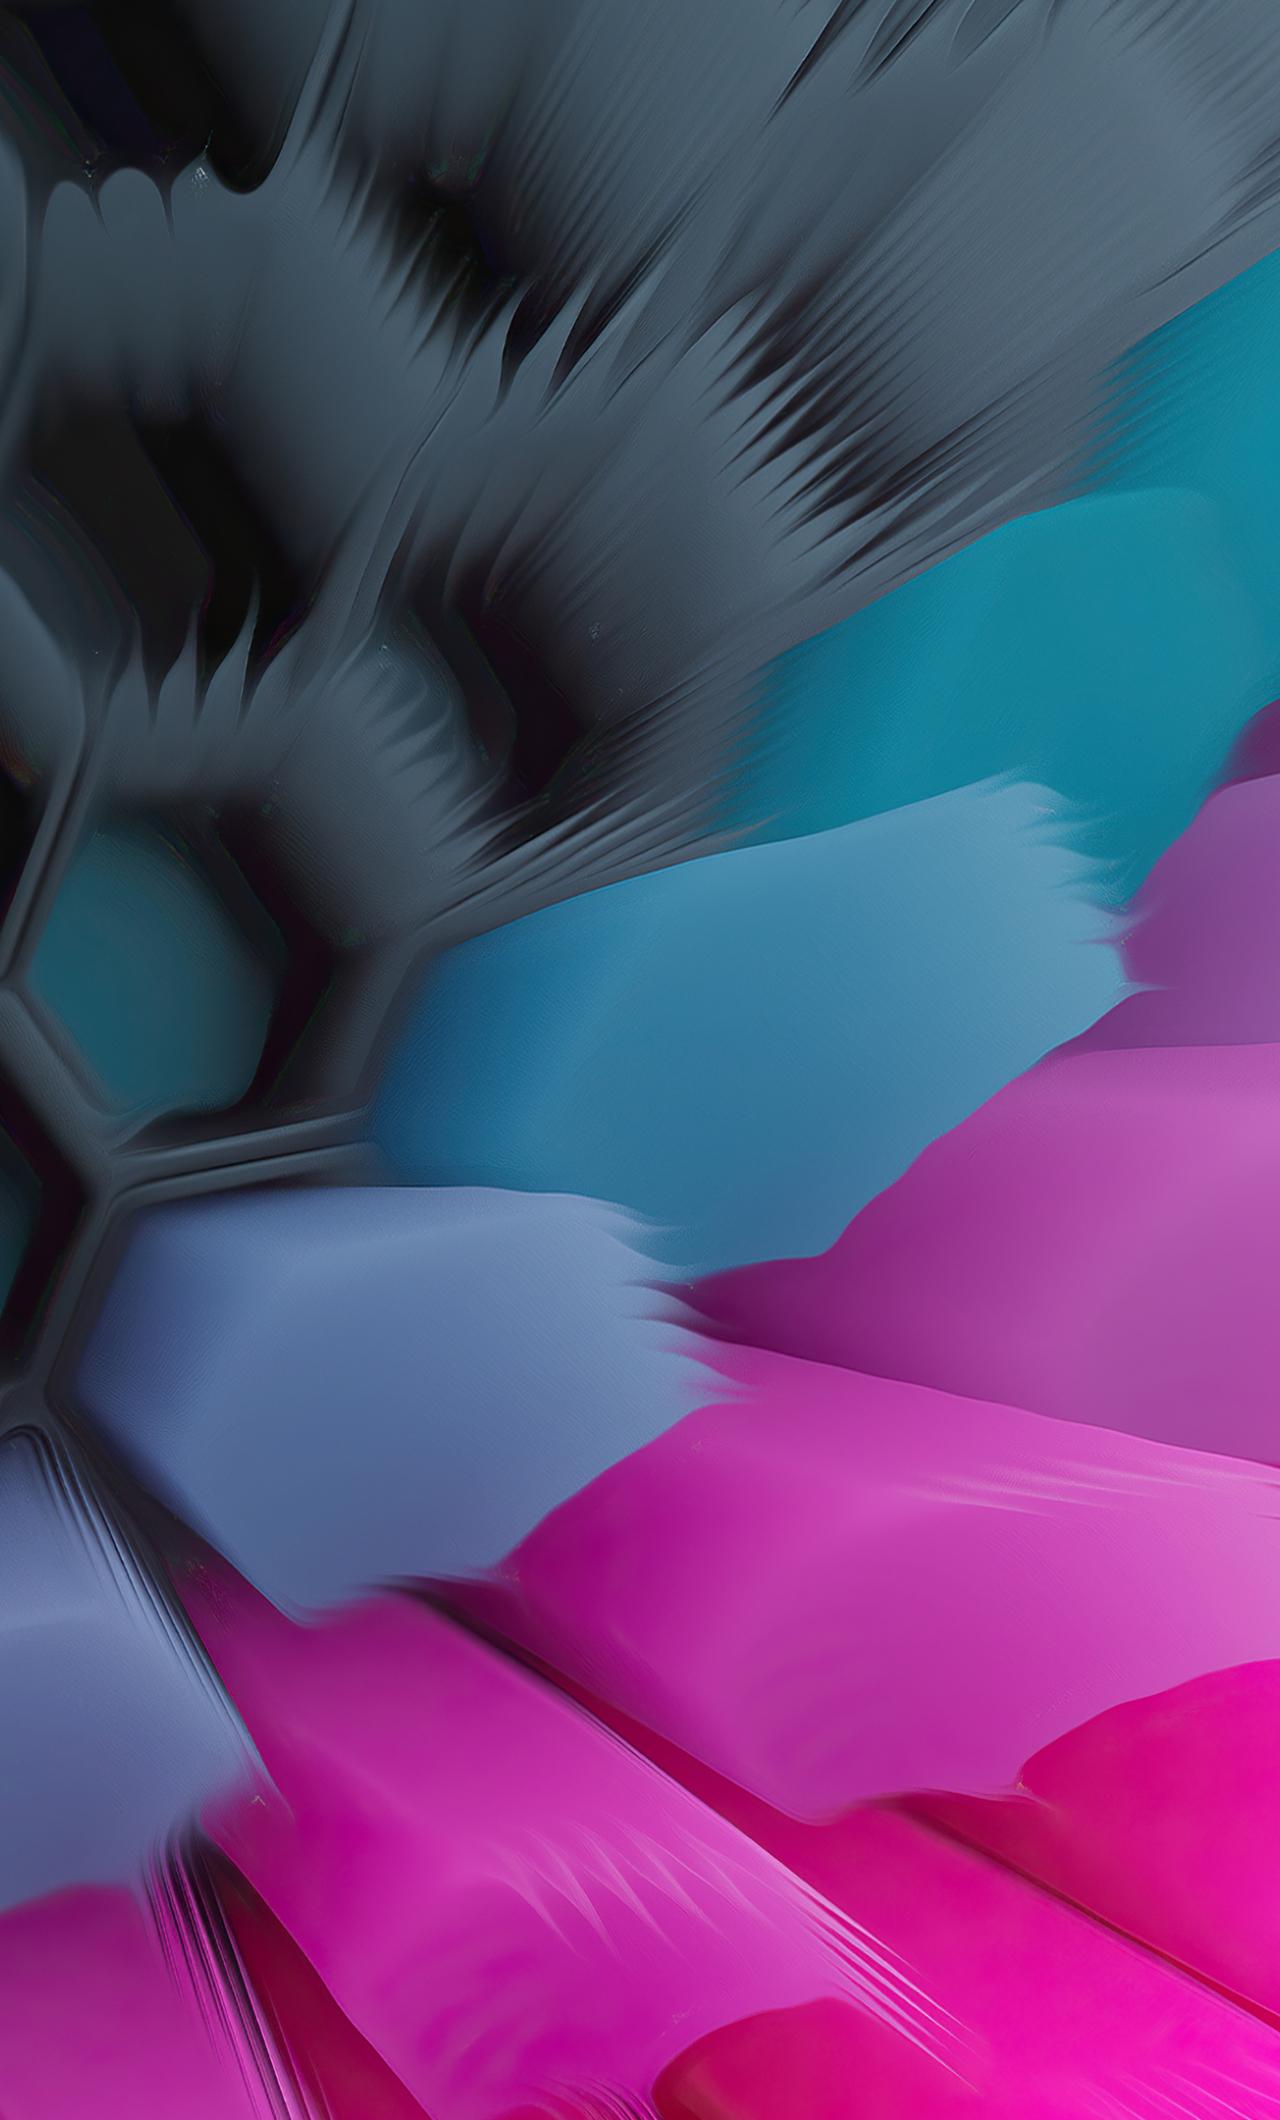 Pink Blue 4K Hexagon Wallpaper in 1280x2120 Resolution